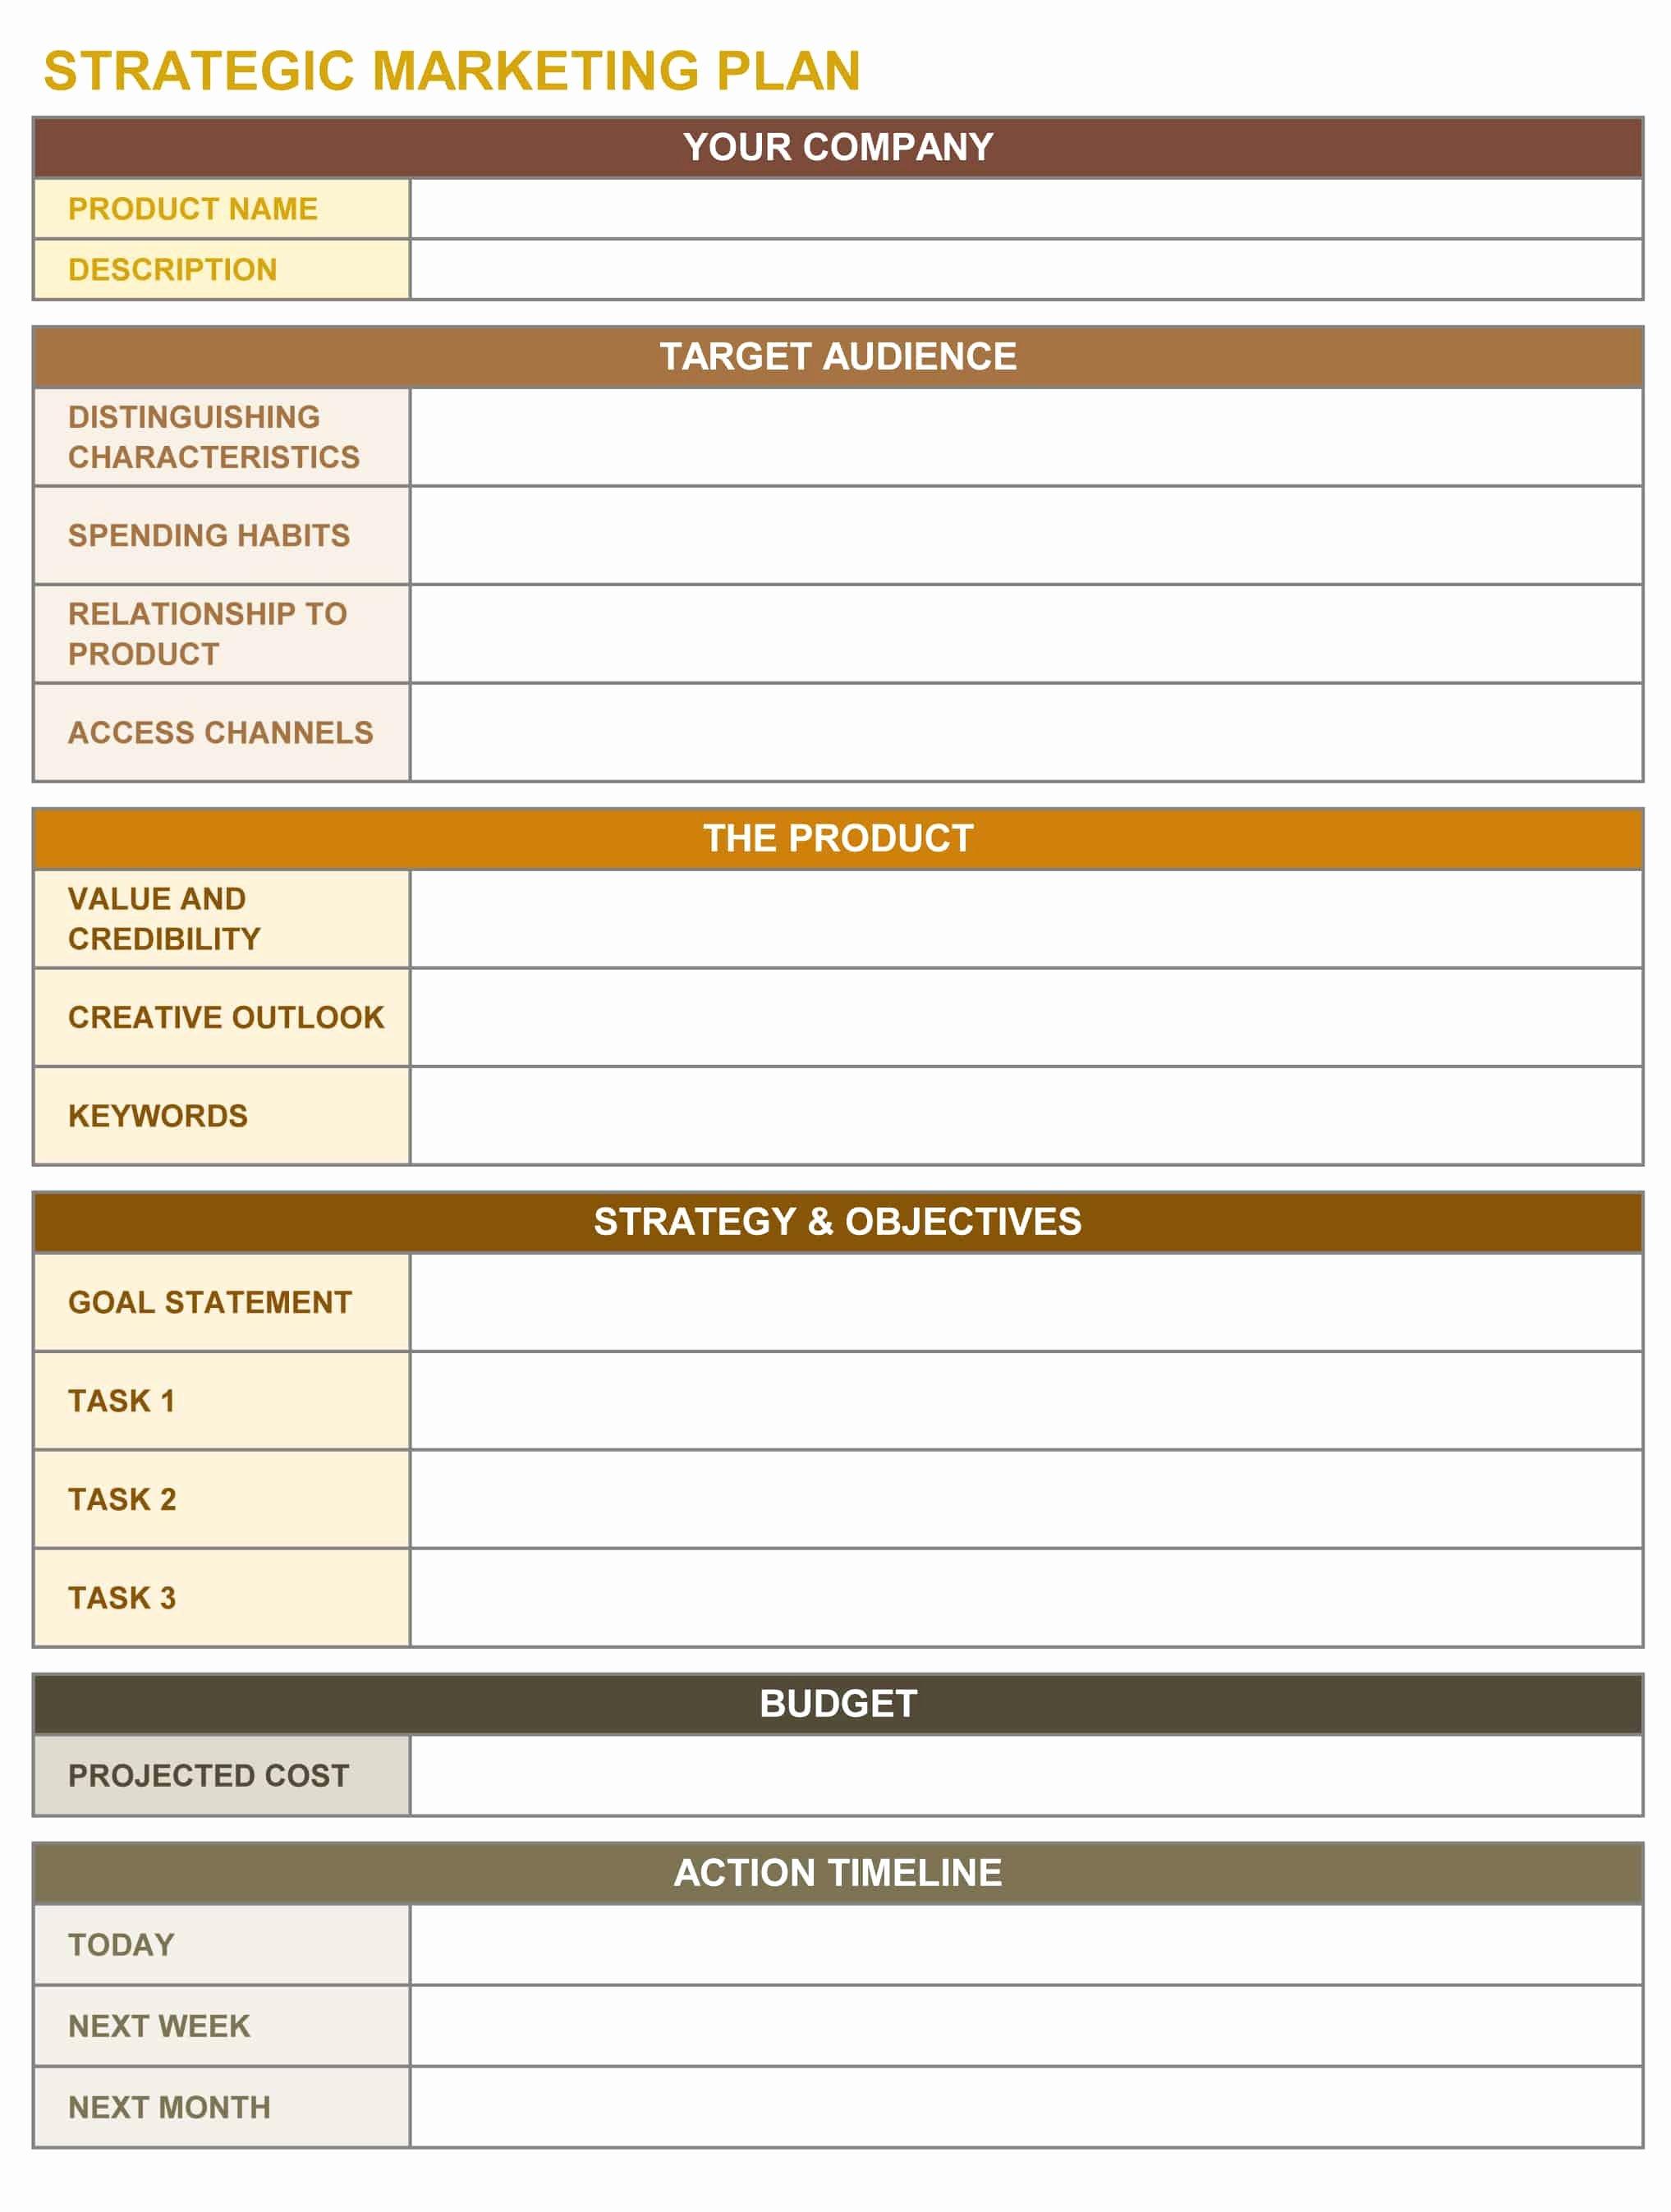 Strategic Plan Template Free Lovely 9 Free Strategic Planning Templates Smartsheet